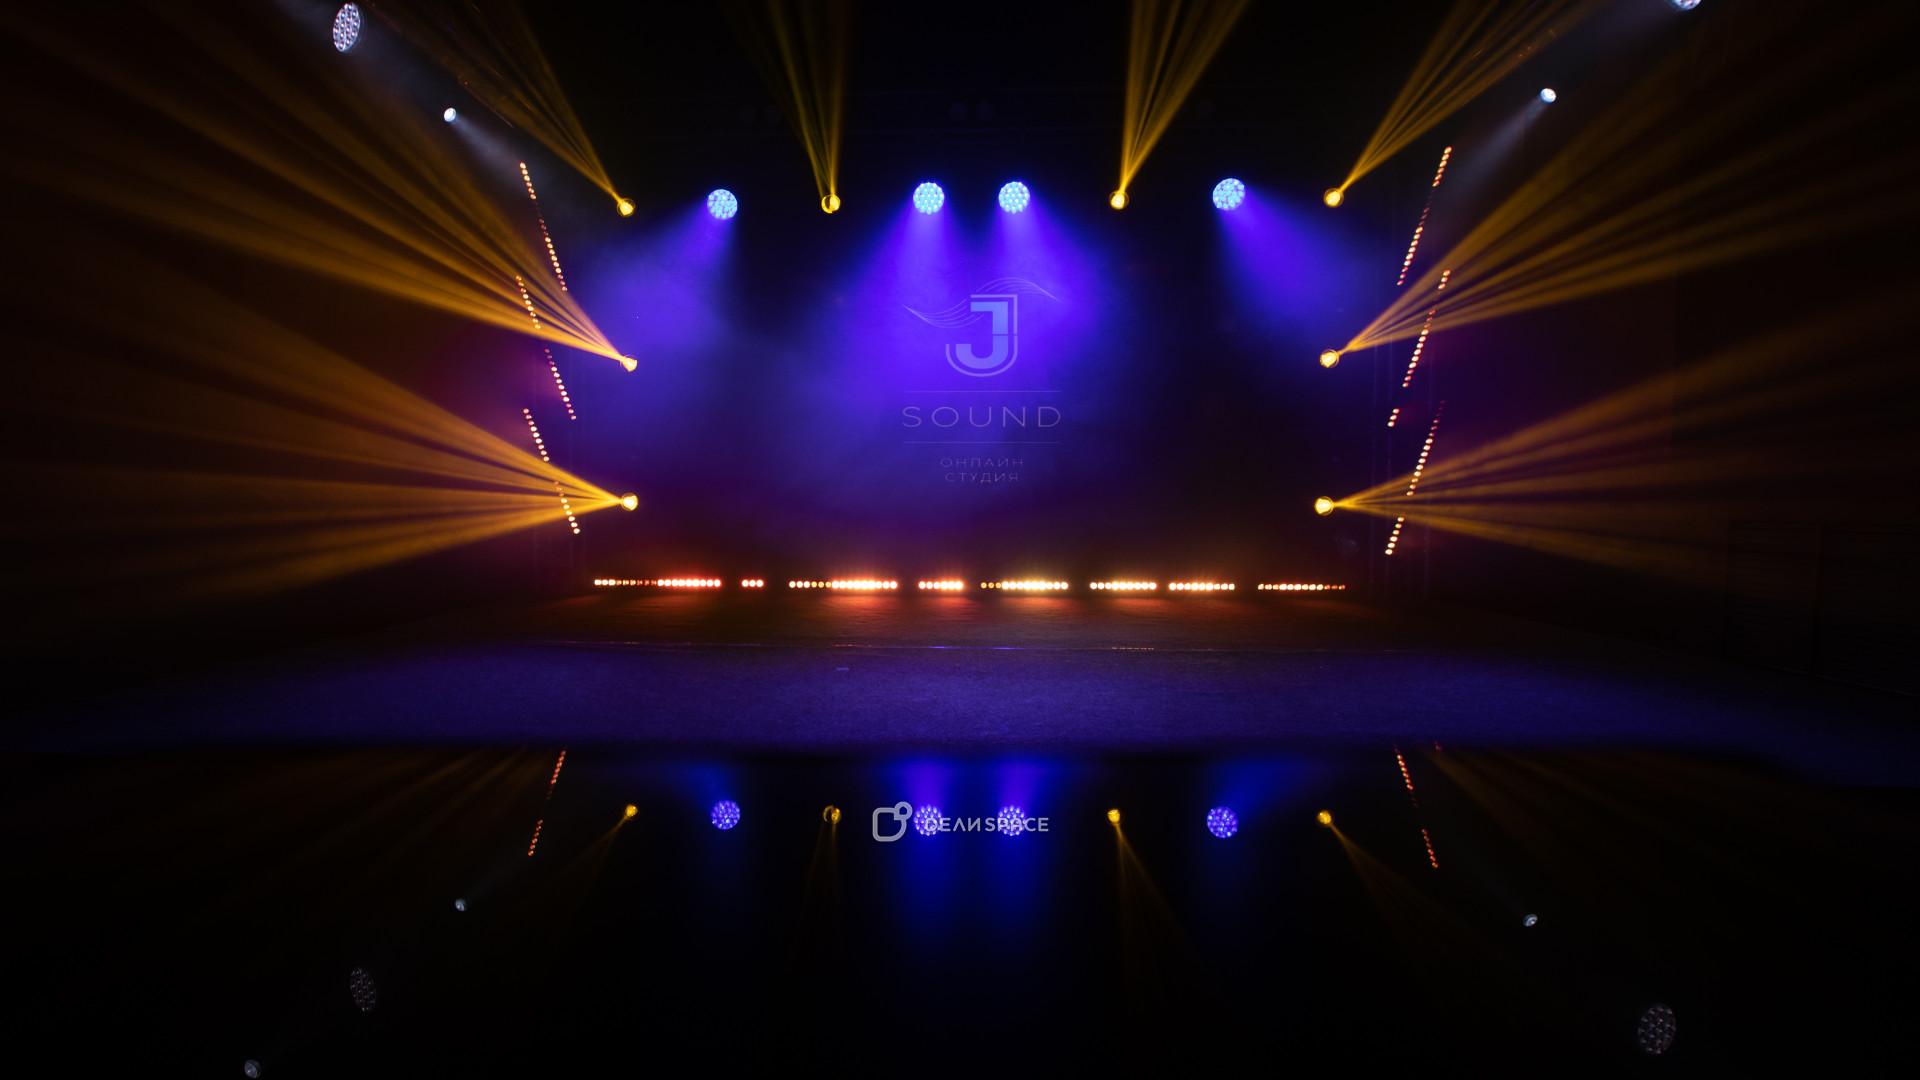 J-Sound концертный зал - фото №5